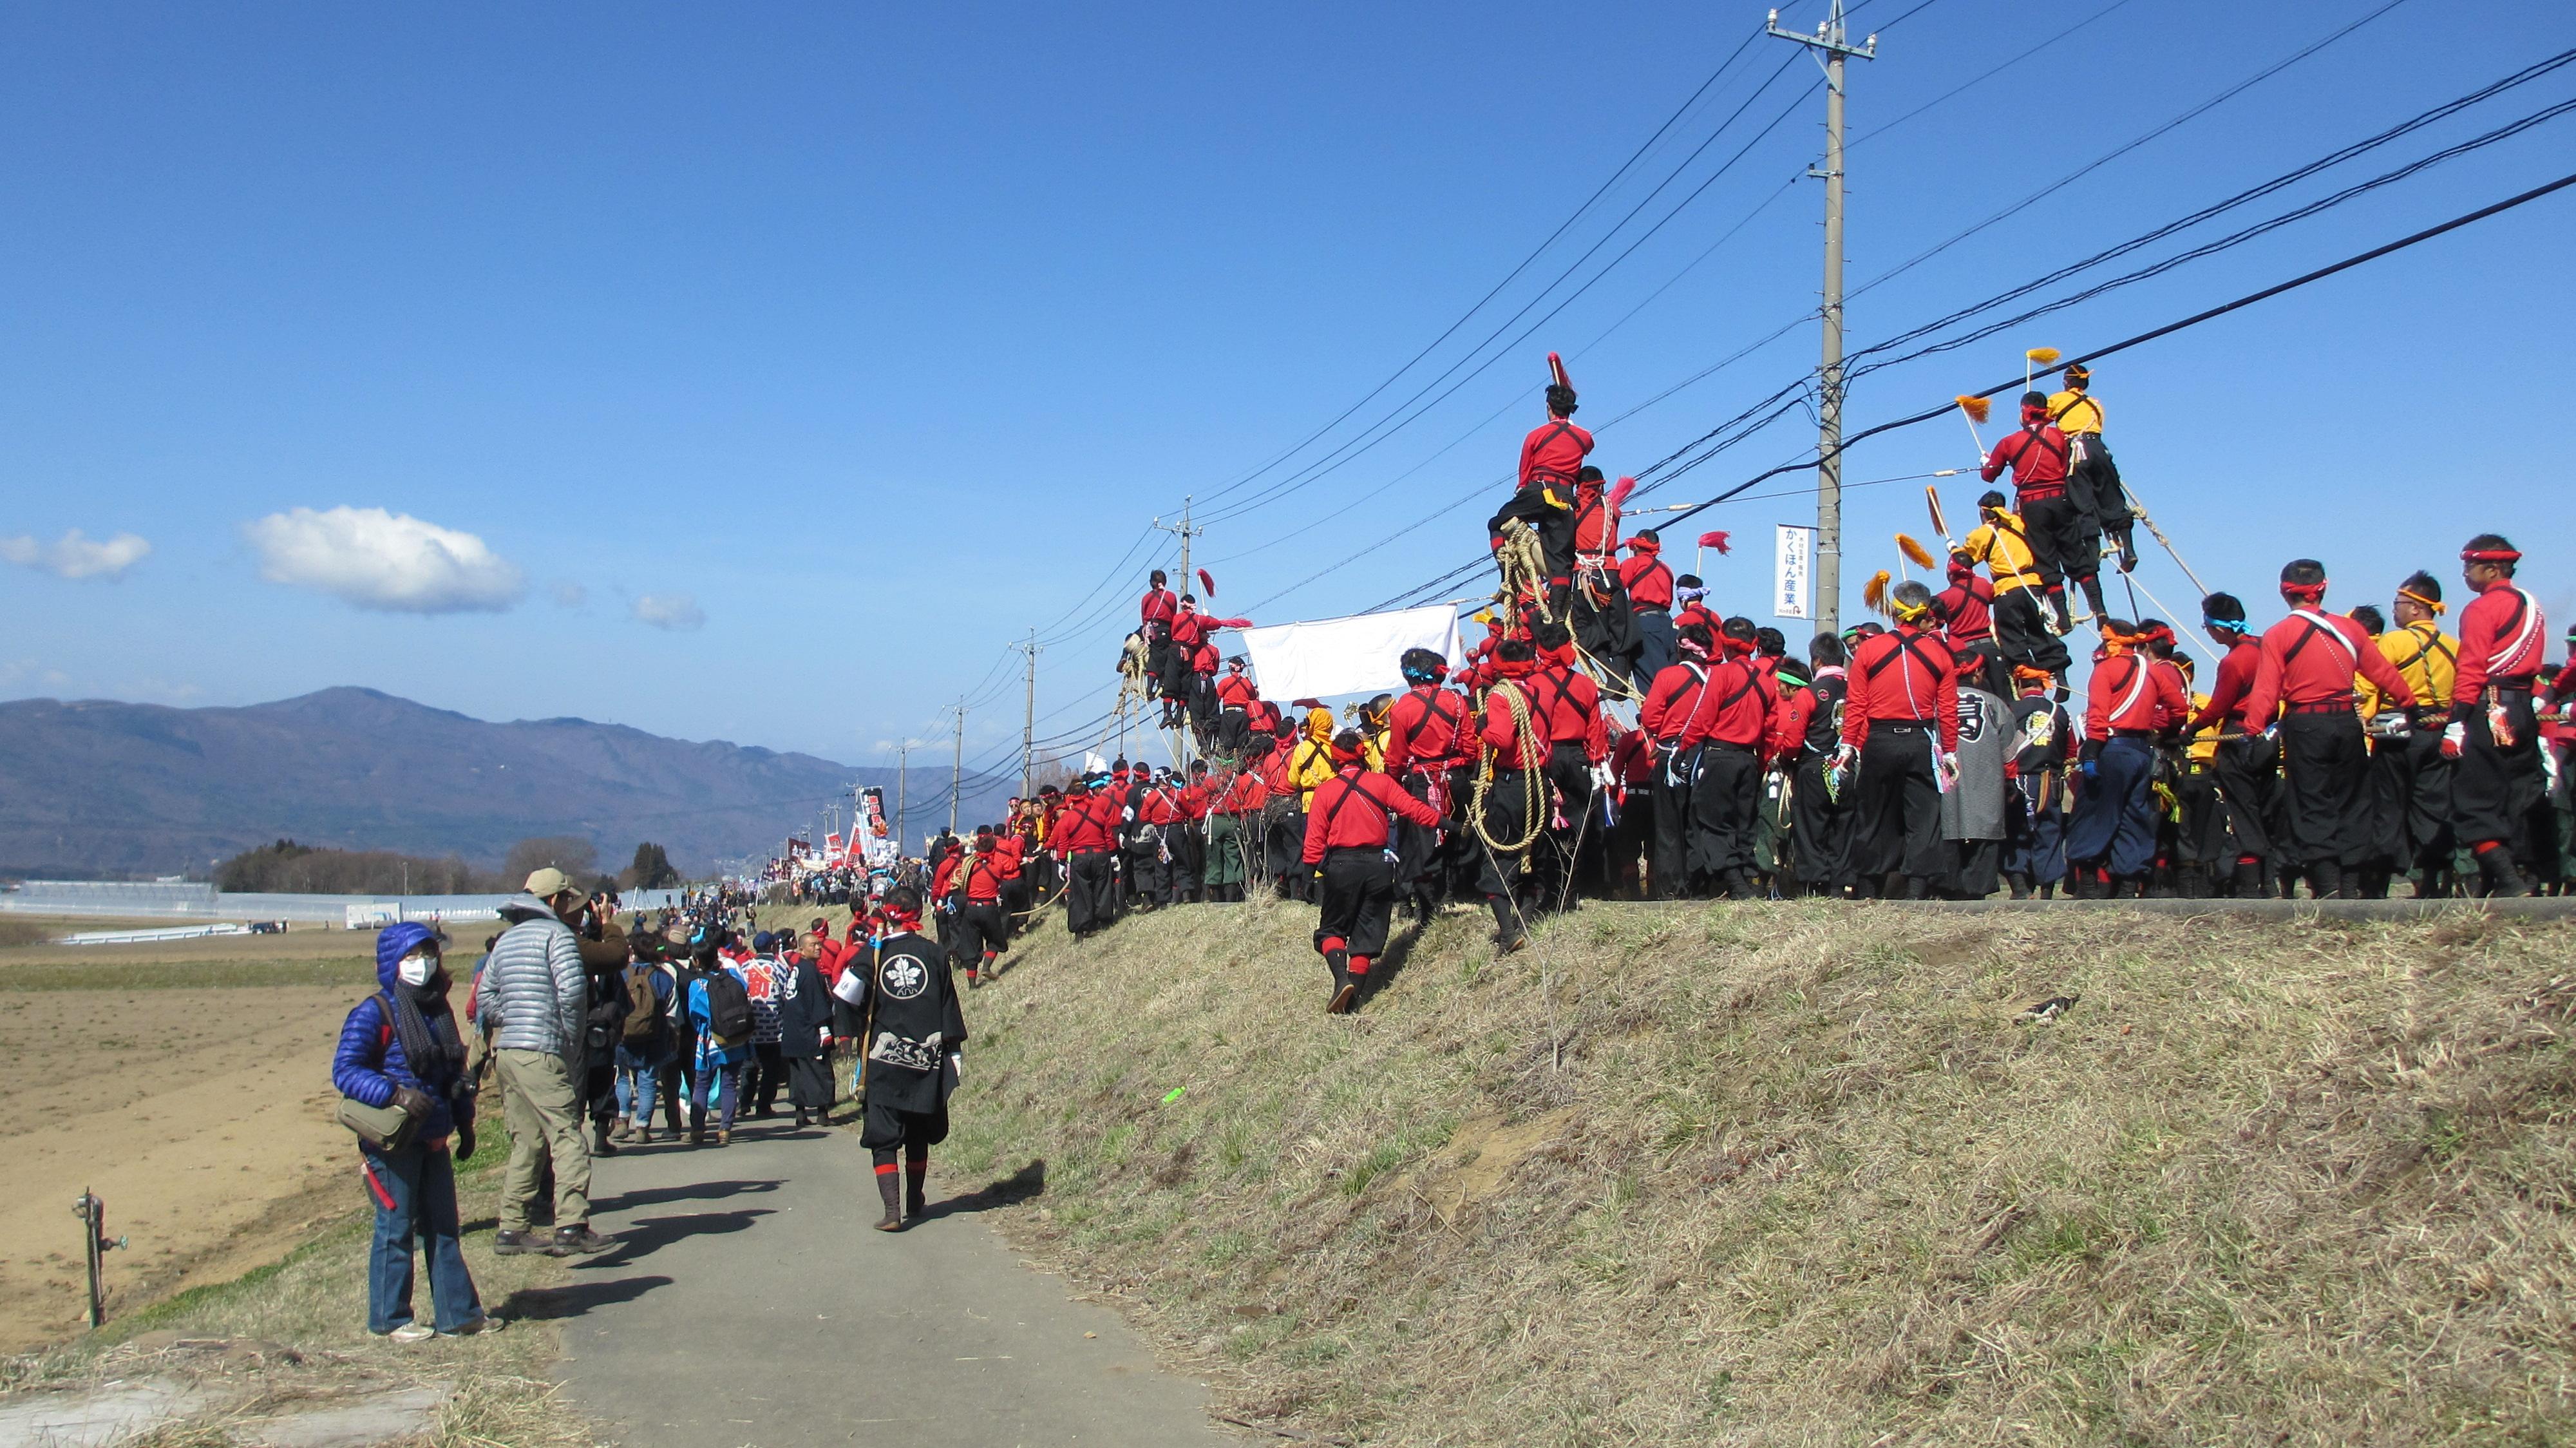 http://www.alpico.co.jp/shikinomori/news/images/IMG_5751.JPG